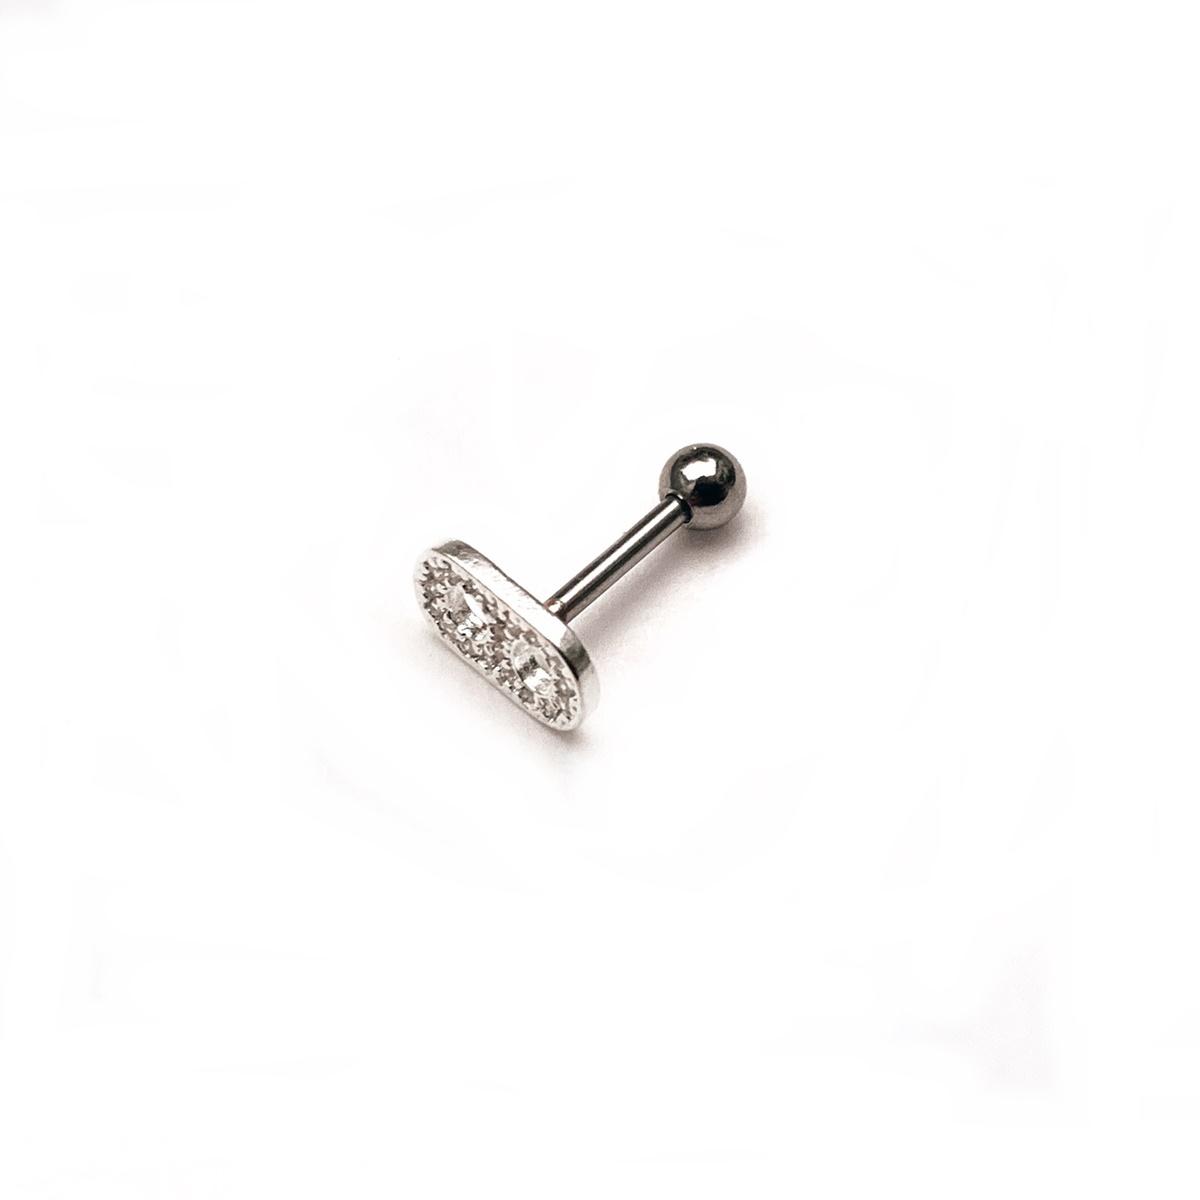 Piercing Tragus Lacre Cravejado 8mm Prata 925